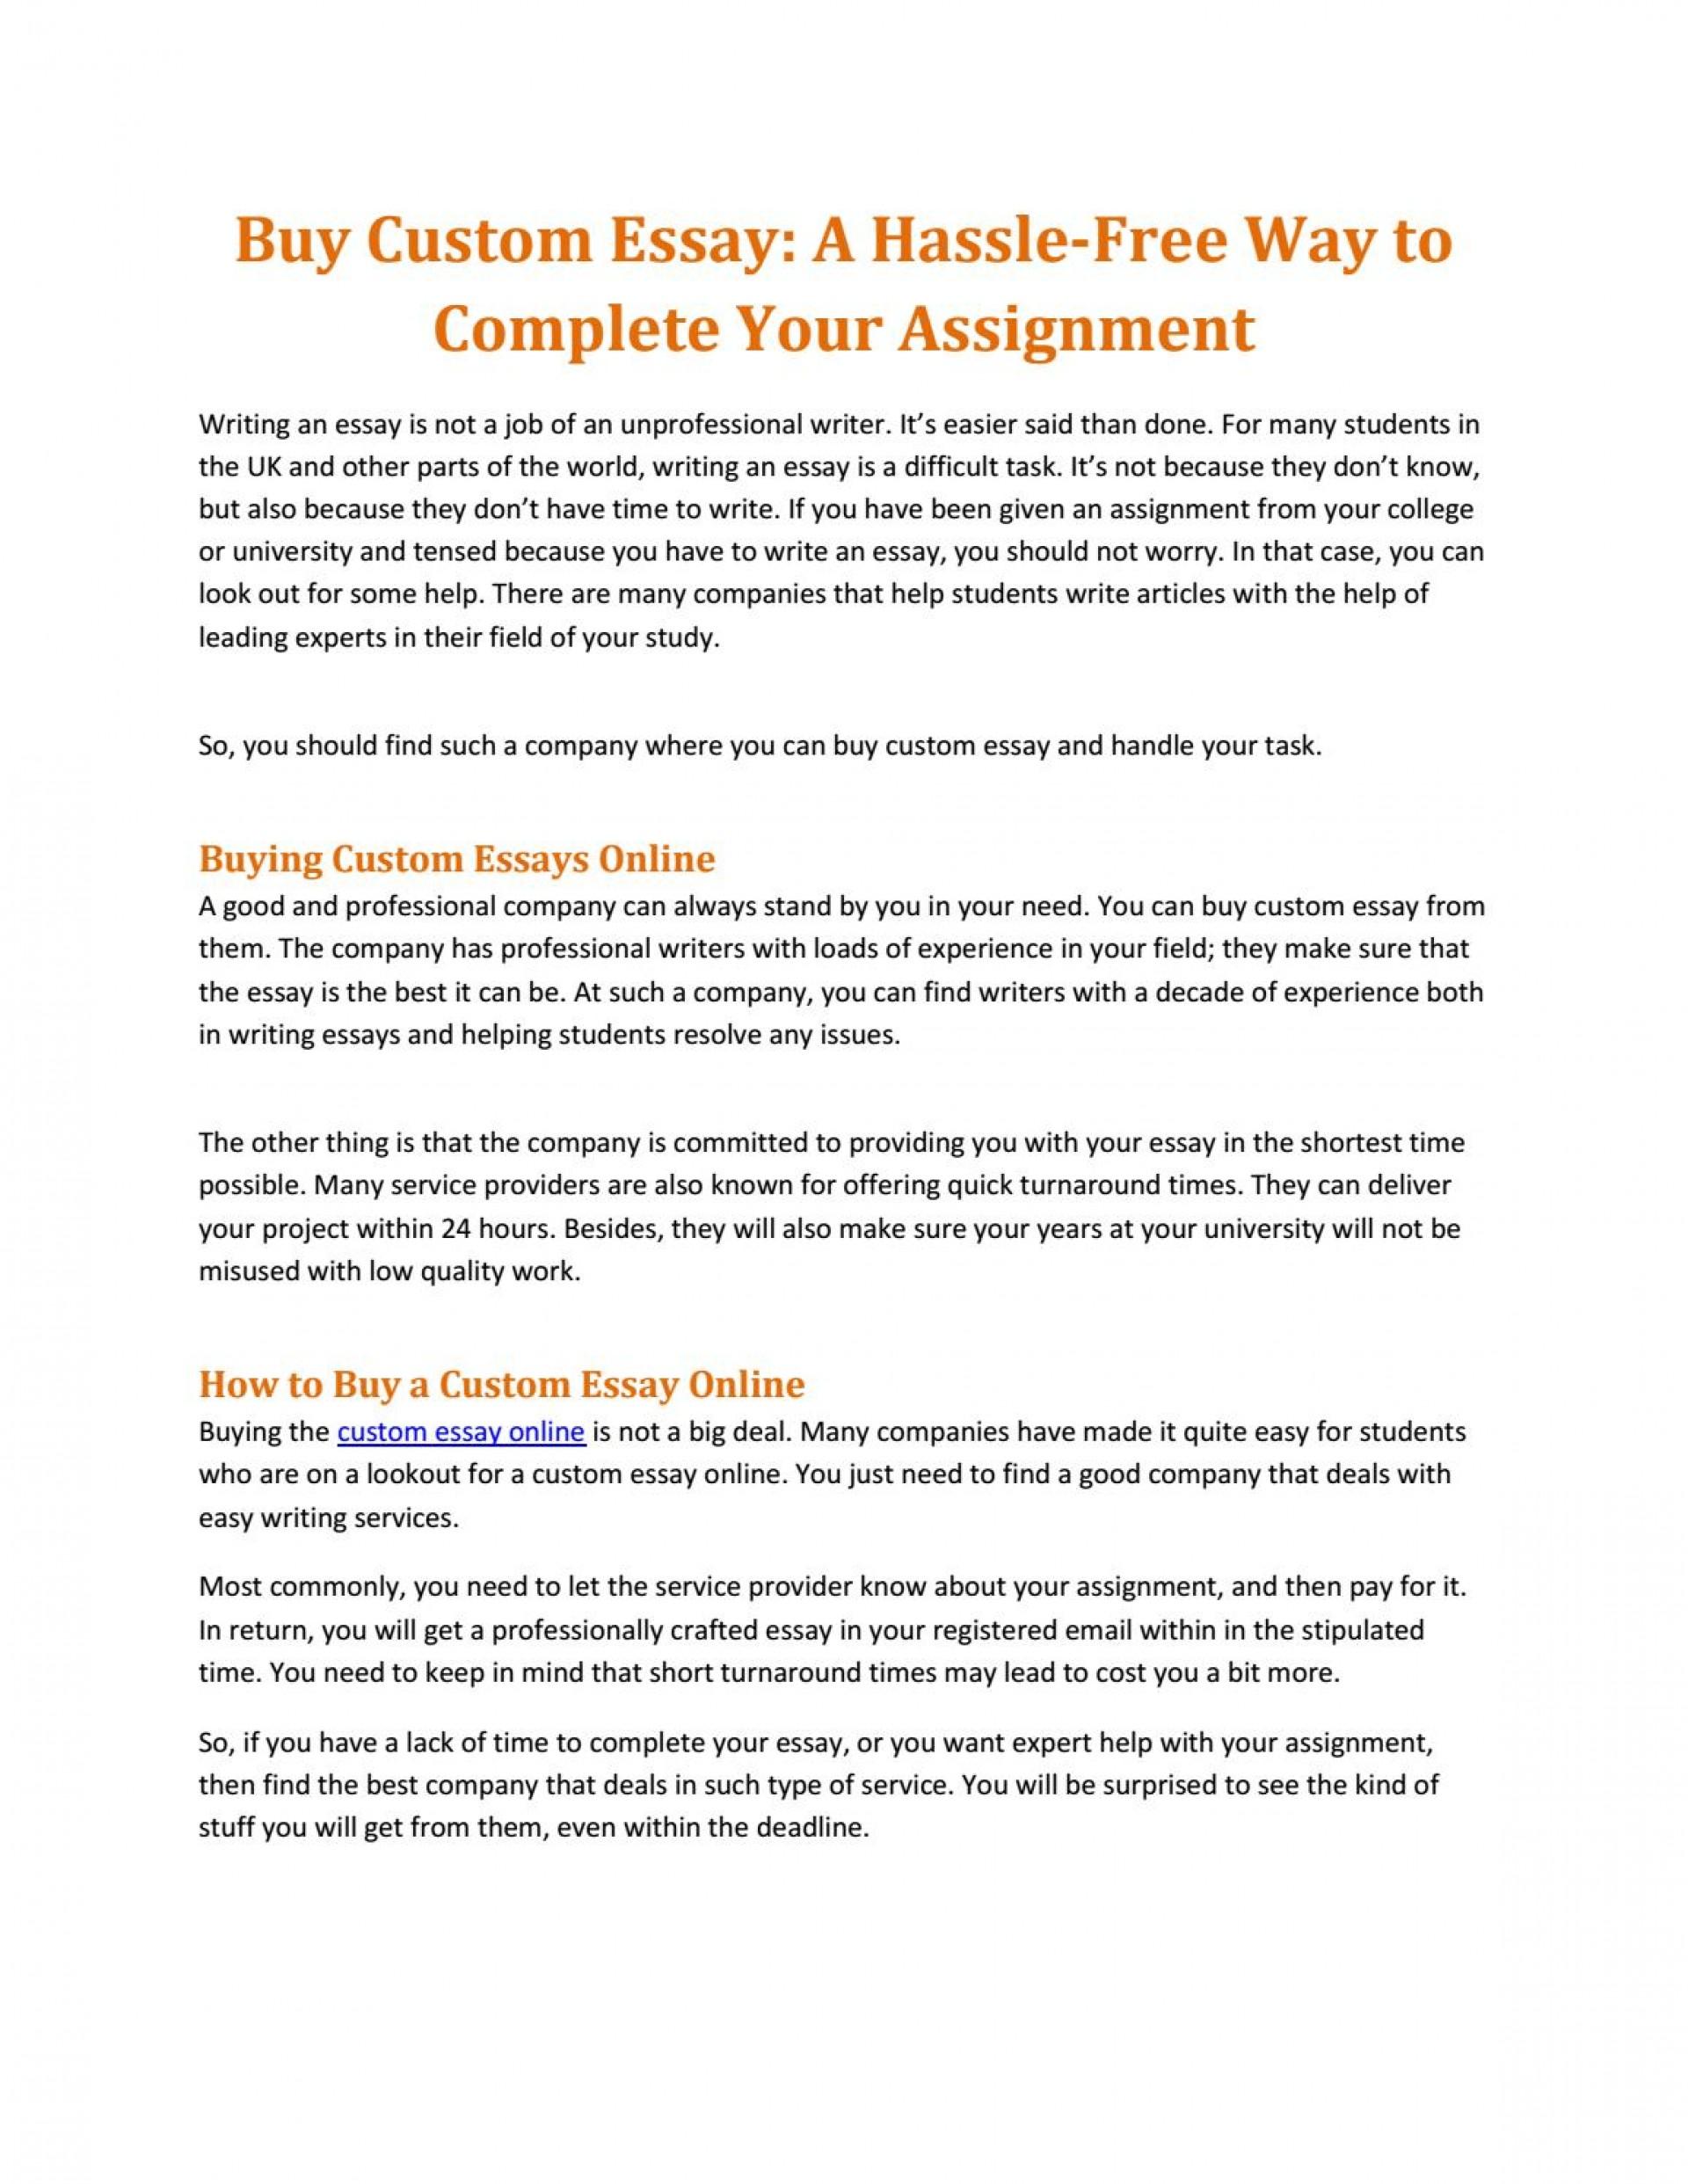 001 Page 1 Buy Custom Essays Online Essay Impressive 1920